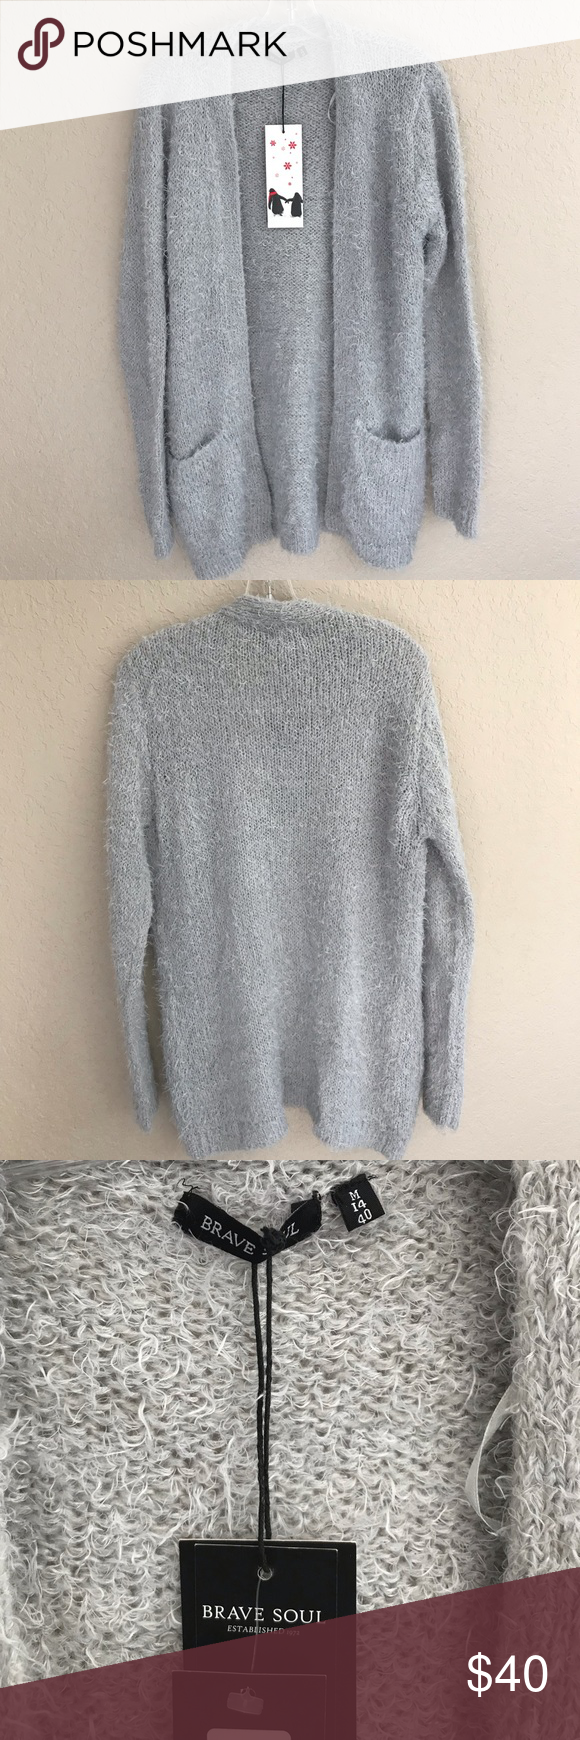 3b64e09a94b Long Gray Fuzzy Cardigan Sweater Soft and comfortable long cardigan ...